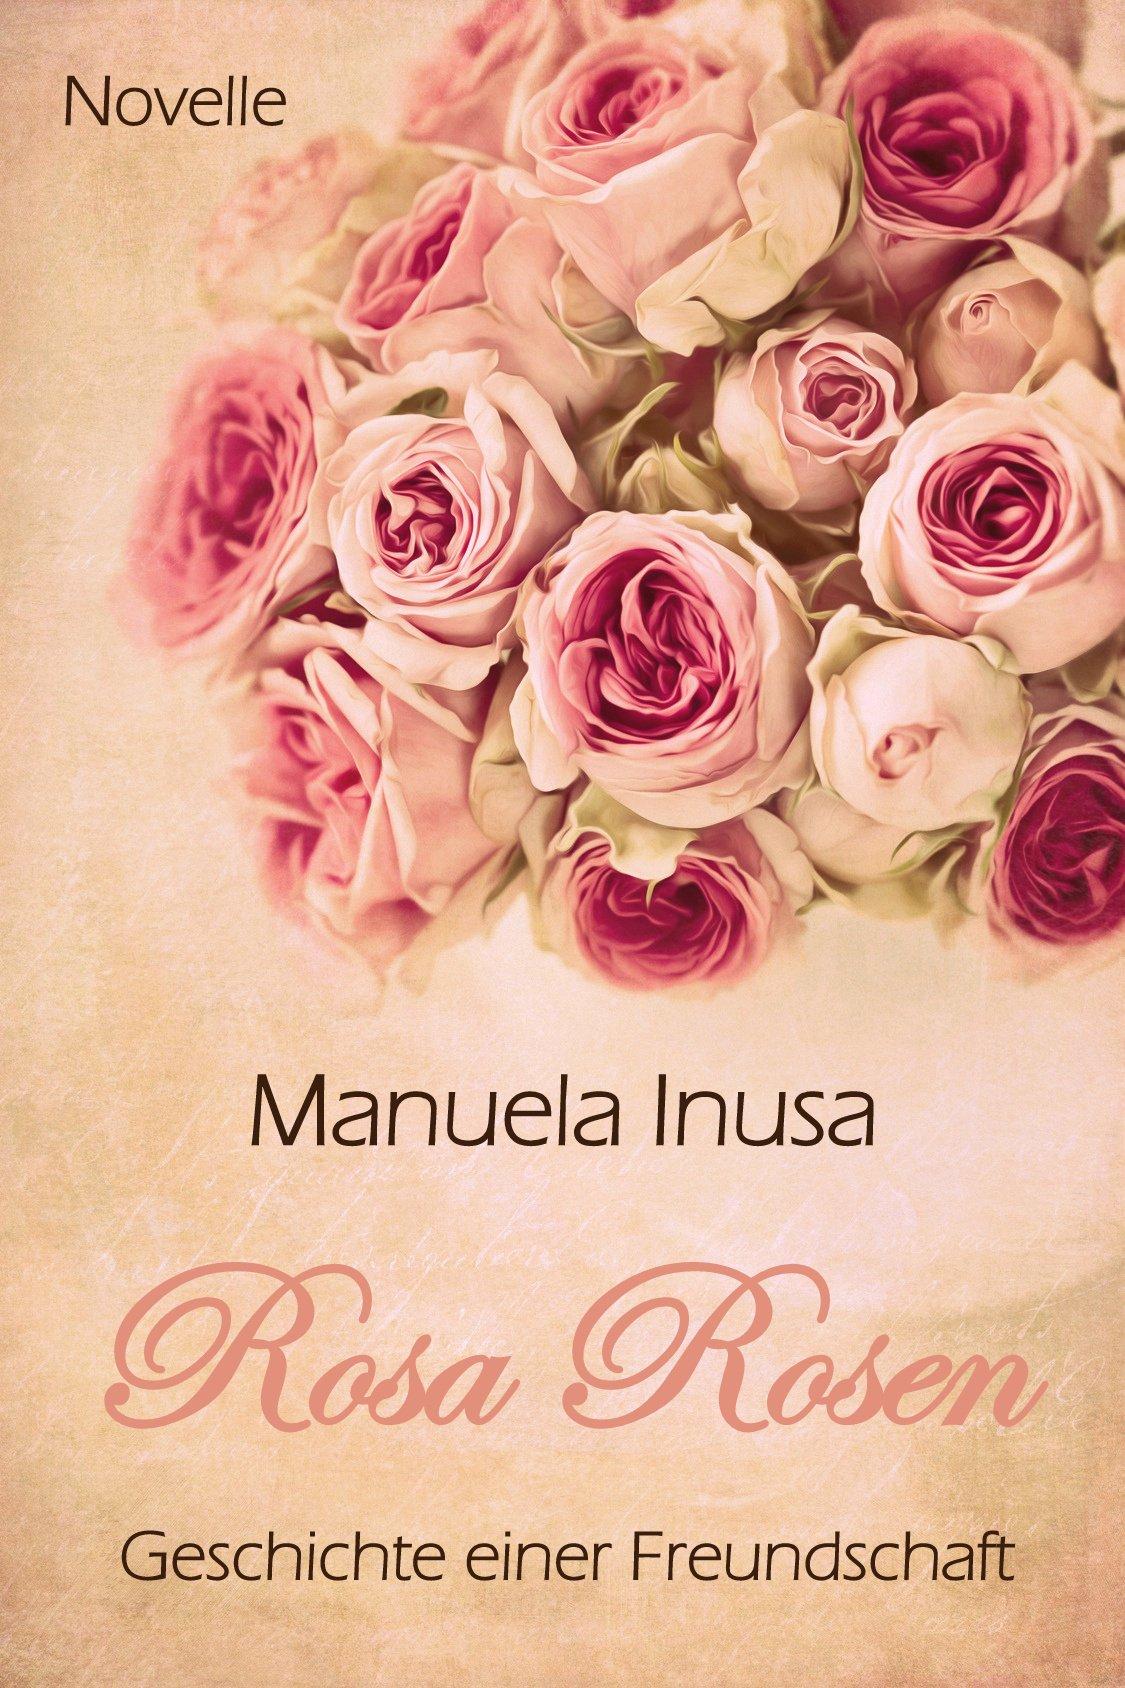 Rosa Rosen - Geschichte einer Freundschaft: Novelle (German Edition) por Manuela Inusa